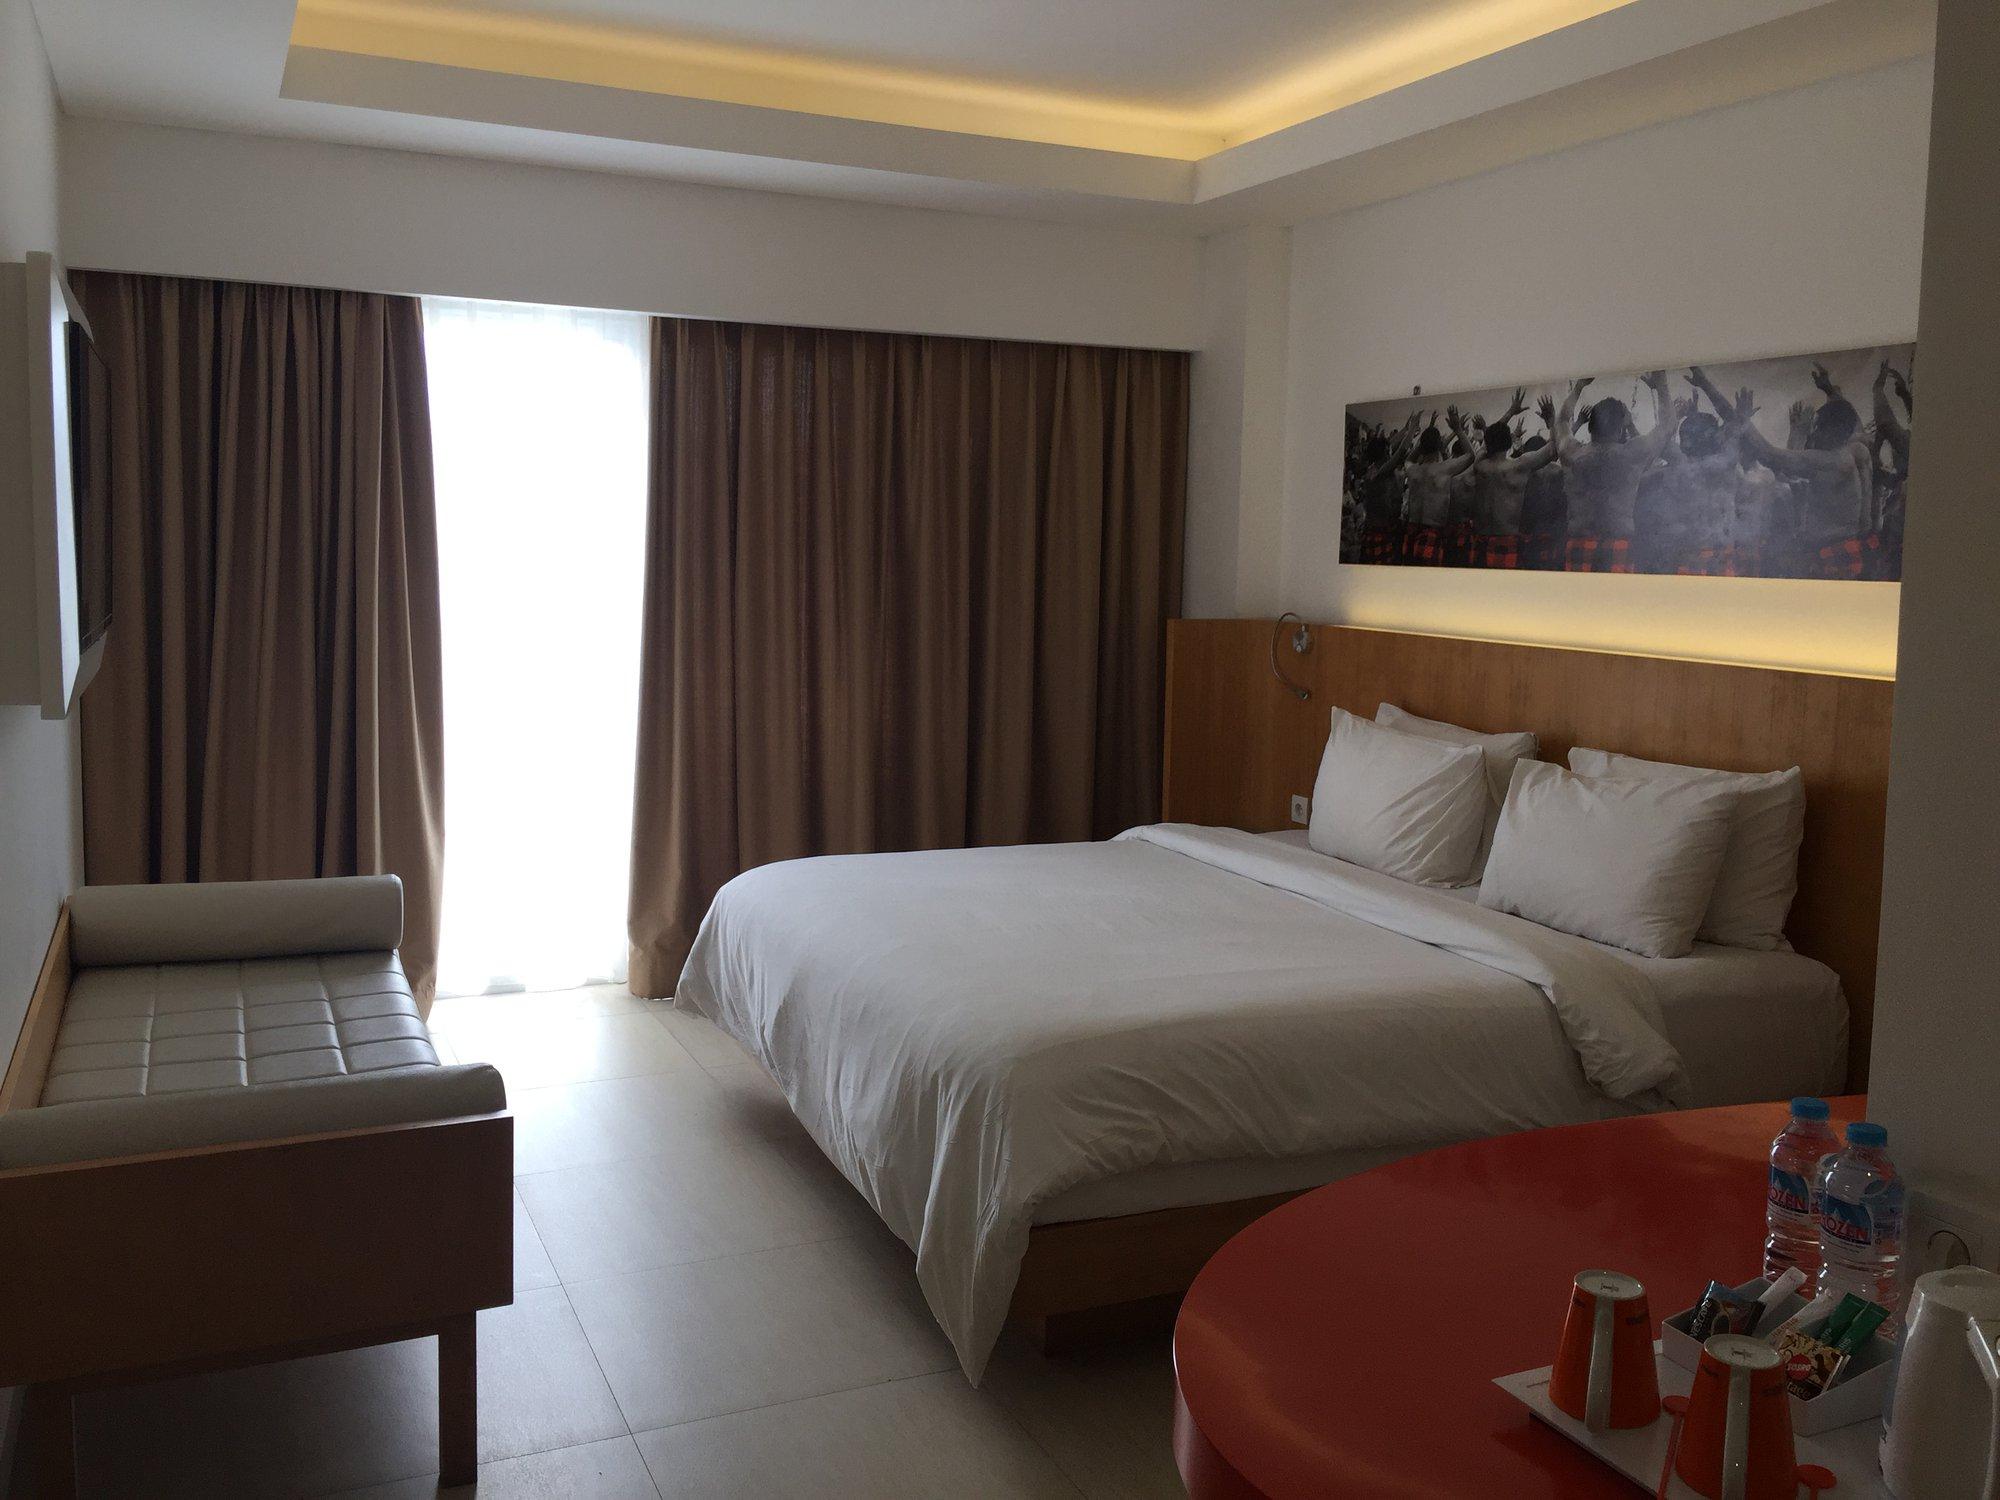 [USP Hotel Reviews] 4D3N Stay at HARRIS Hotel Kuta Galleria, Bali